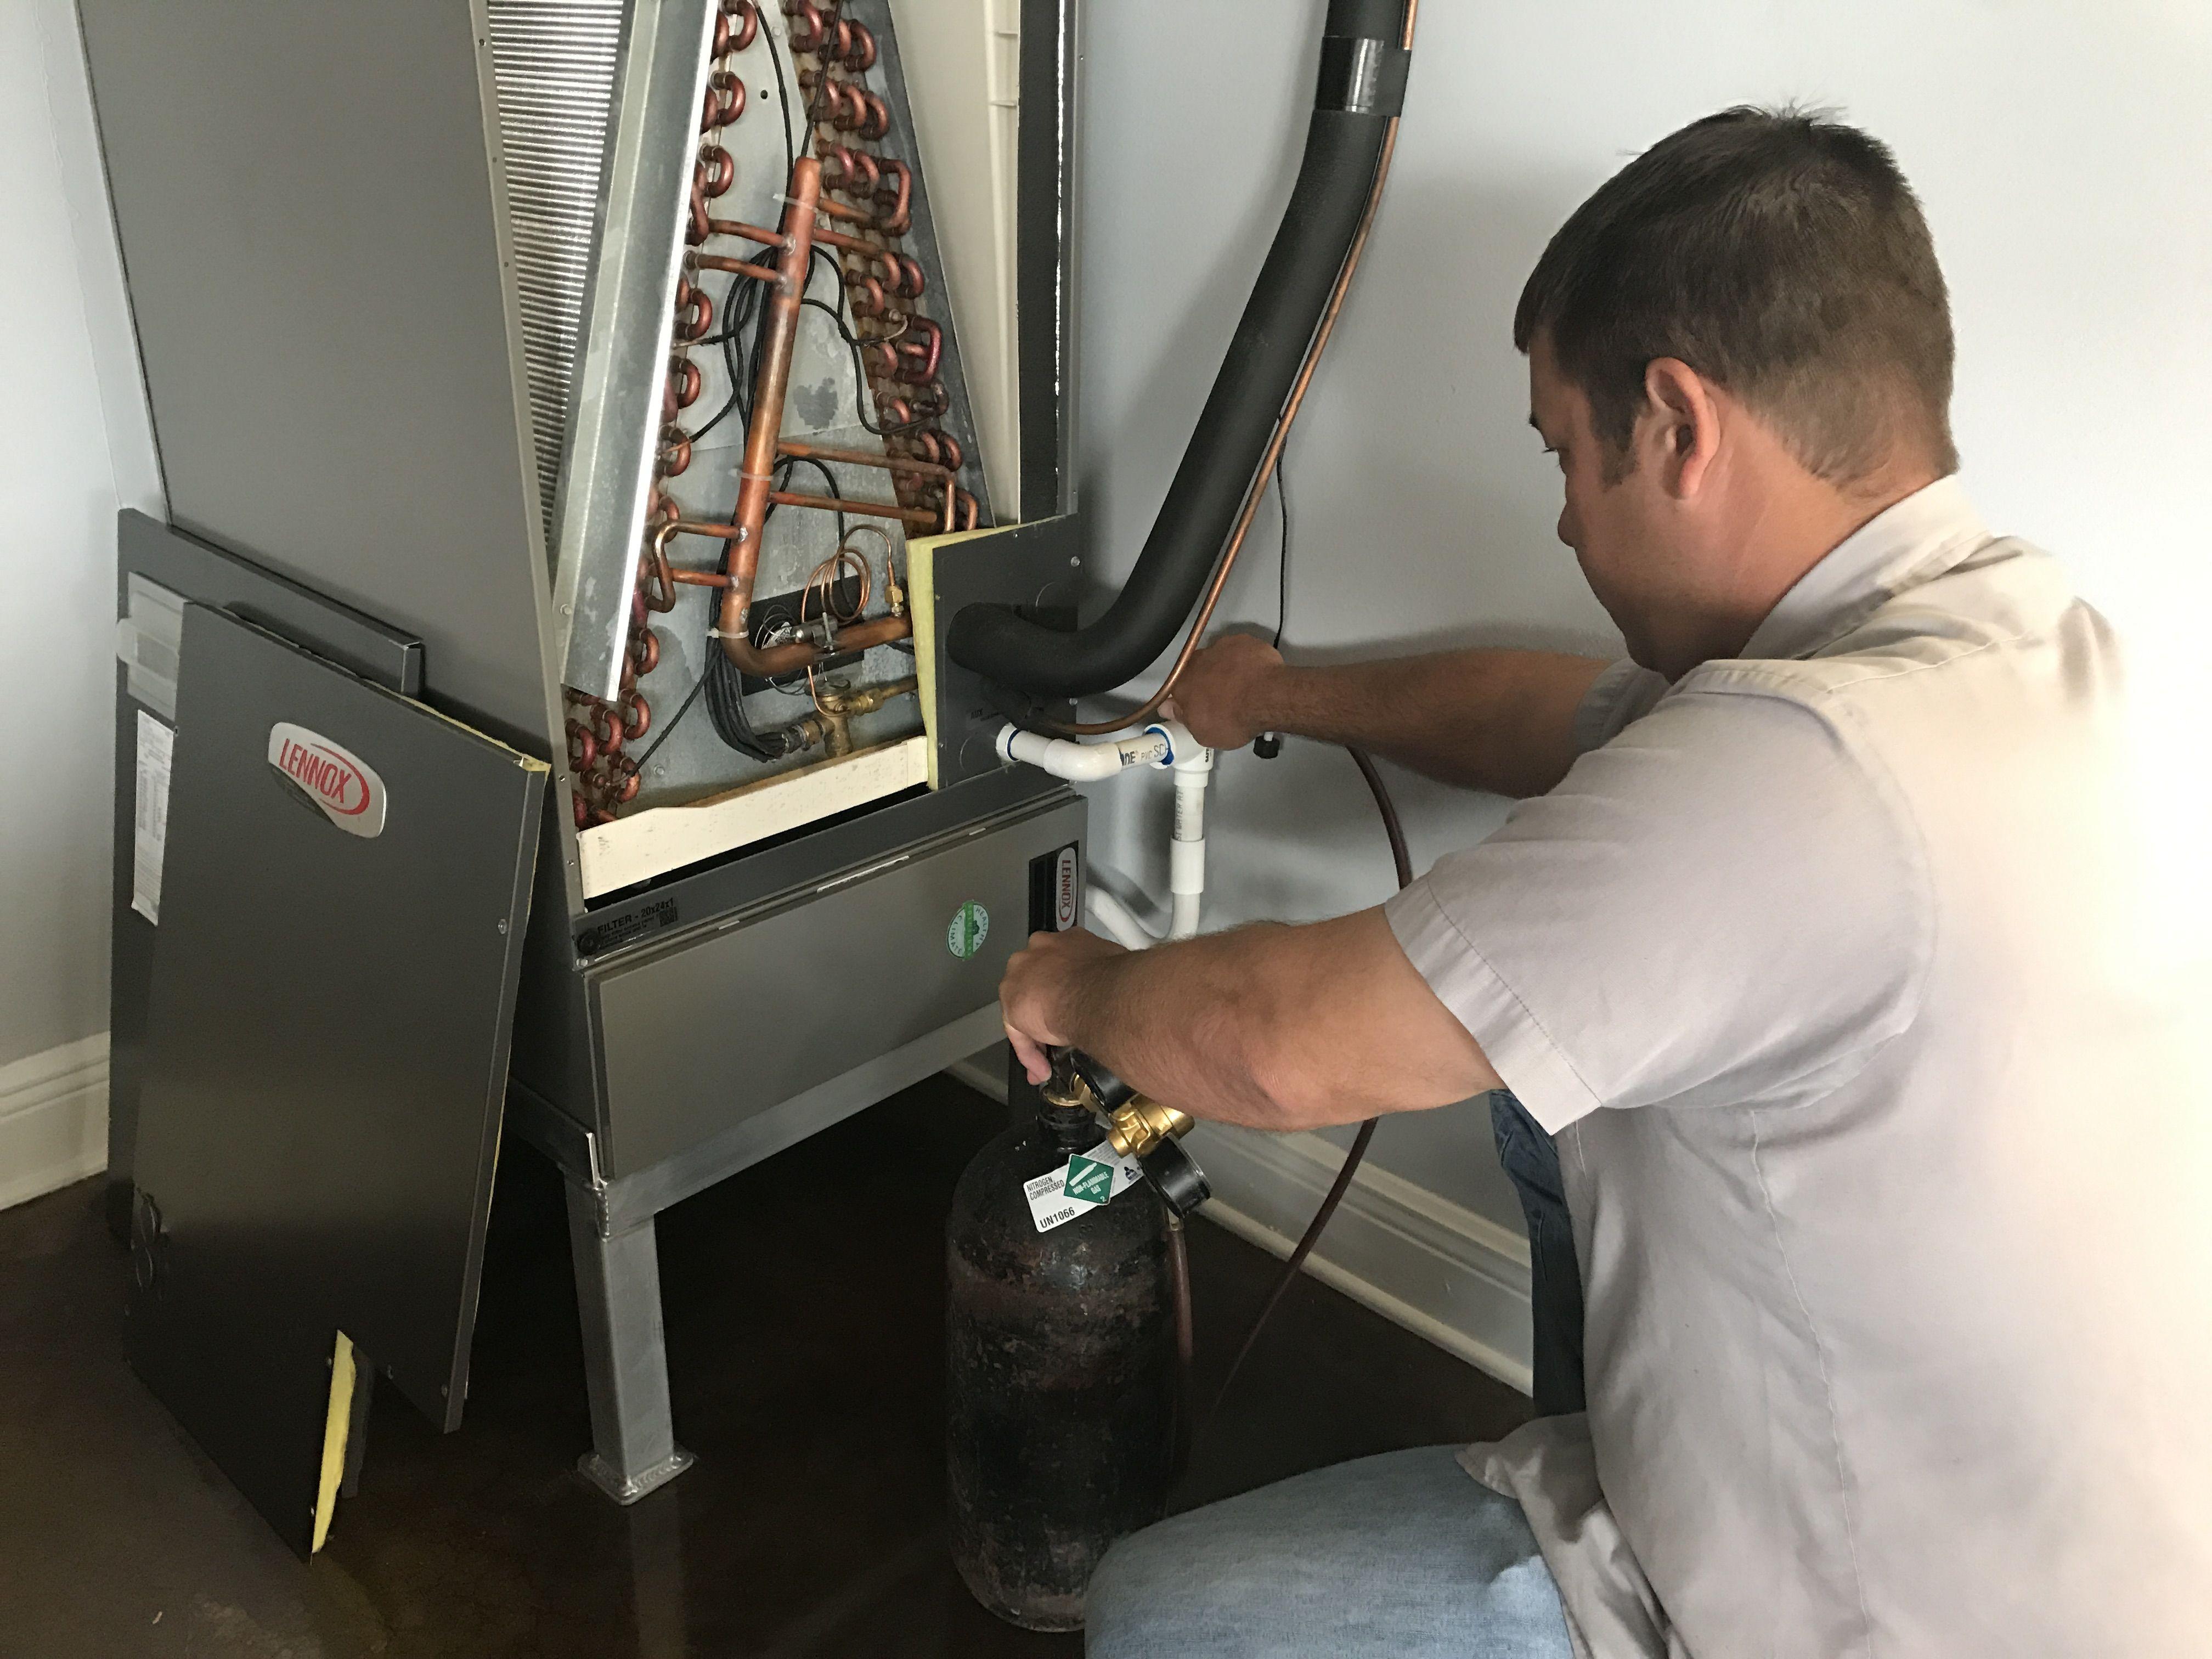 A Preventative Maintenance service checks entire system